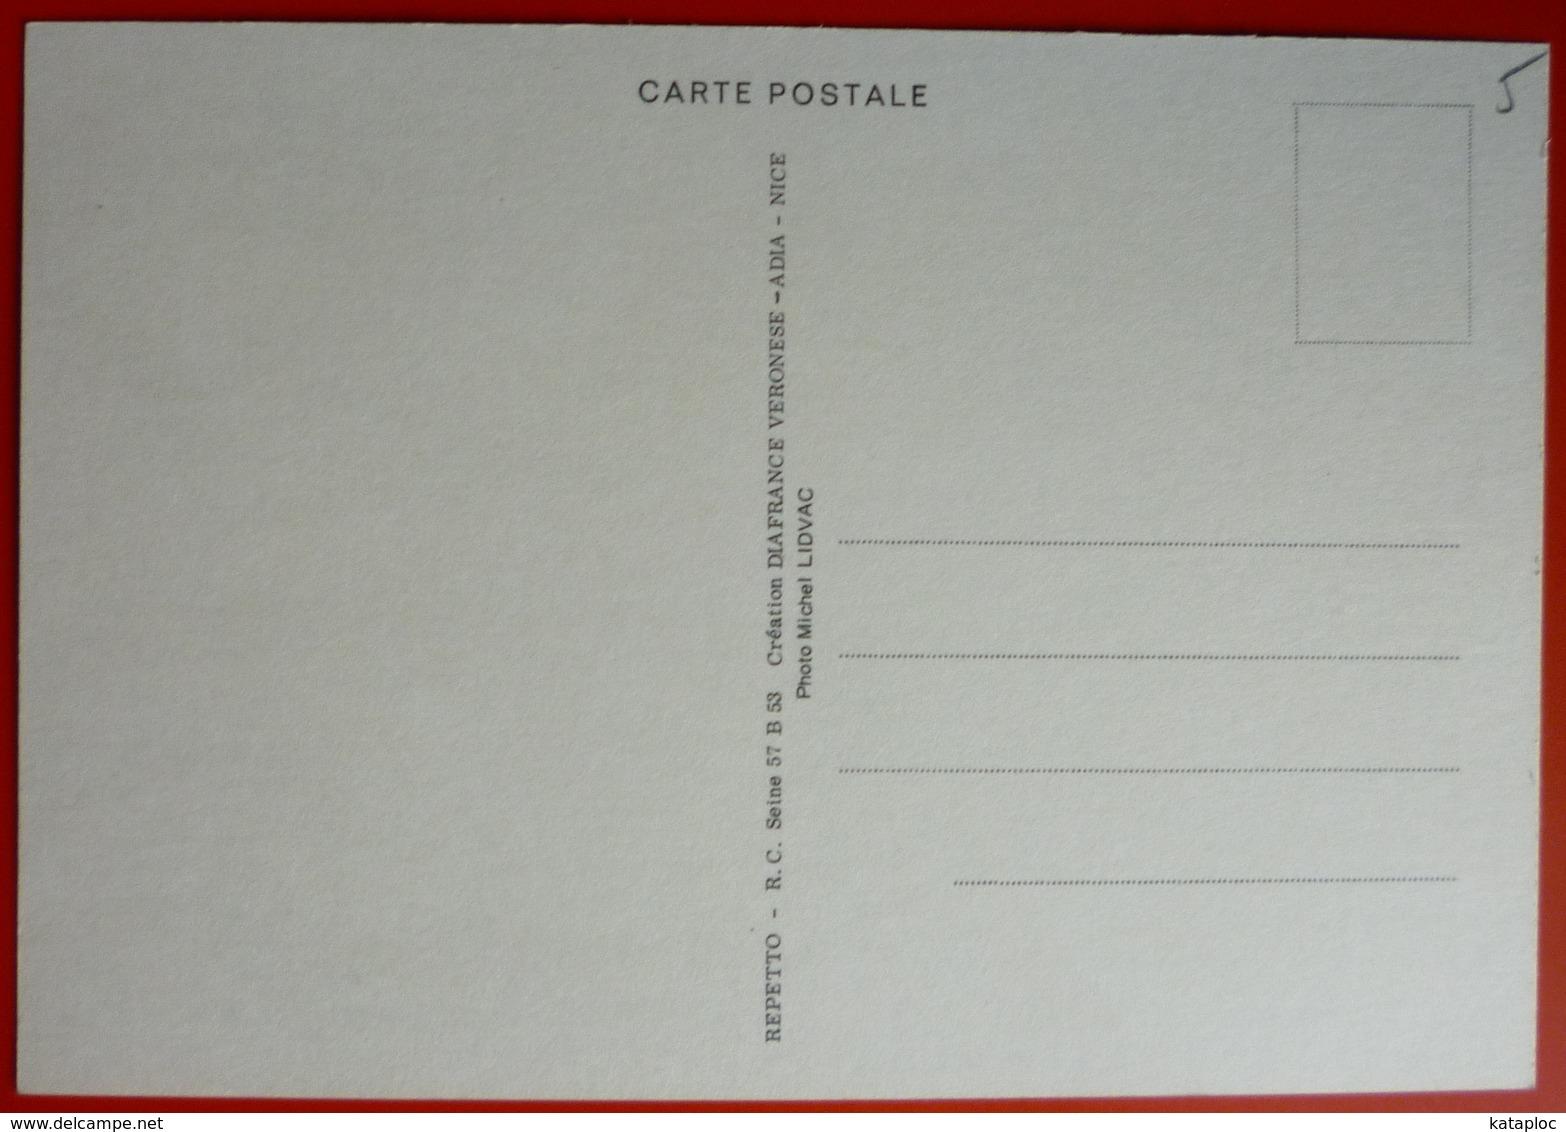 CARTE LA DANSE C'EST REPETTO - NOELLA PONTOIS - DANSEUSE OPERA - SCAN RECTO/VERSO - Danse